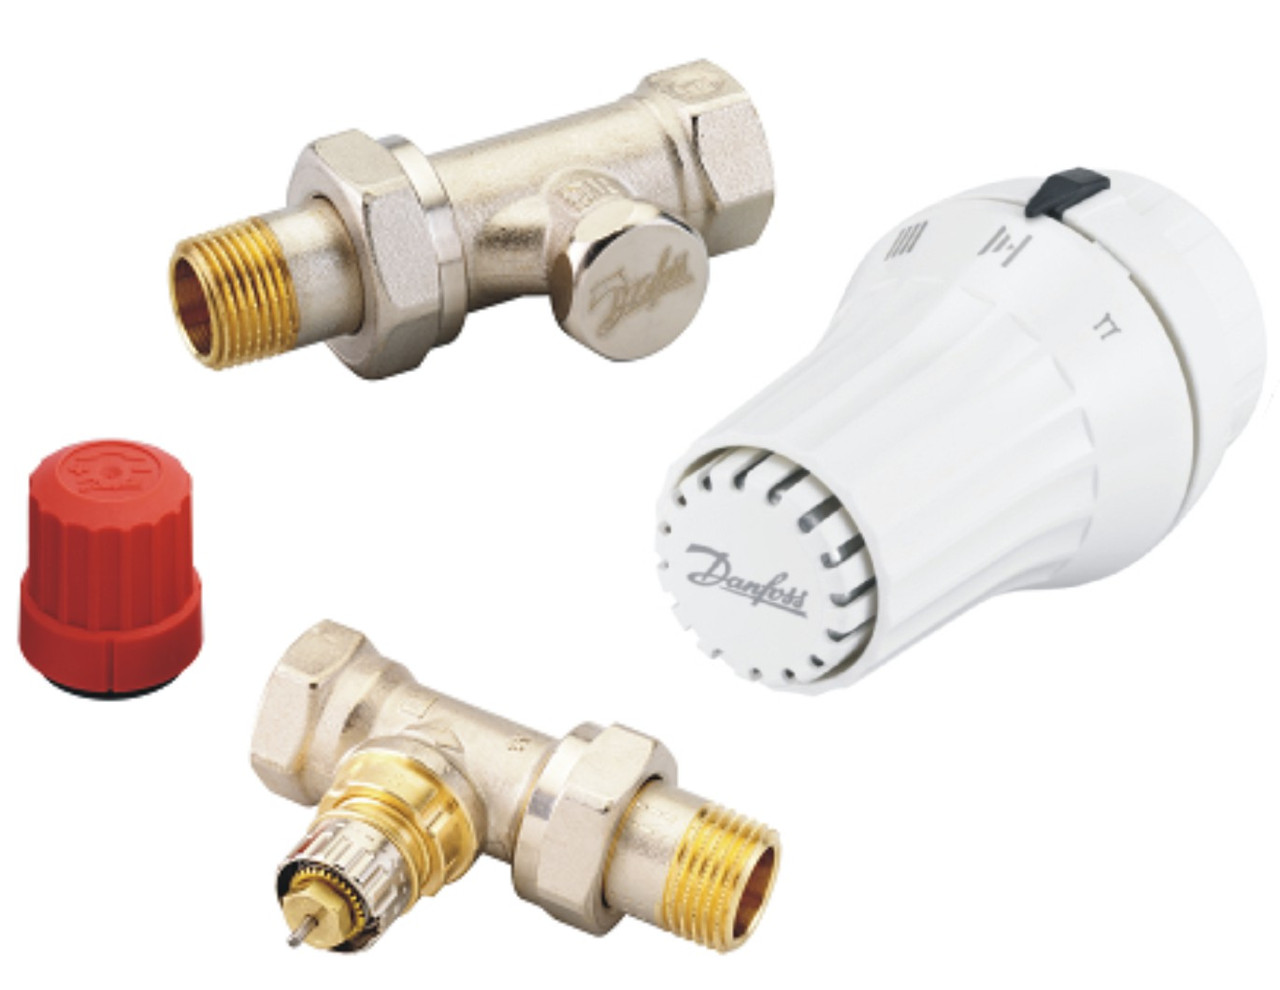 Комплект: прямой клапан RA-N + термоголовка RAE + клапан запорный RLV-S